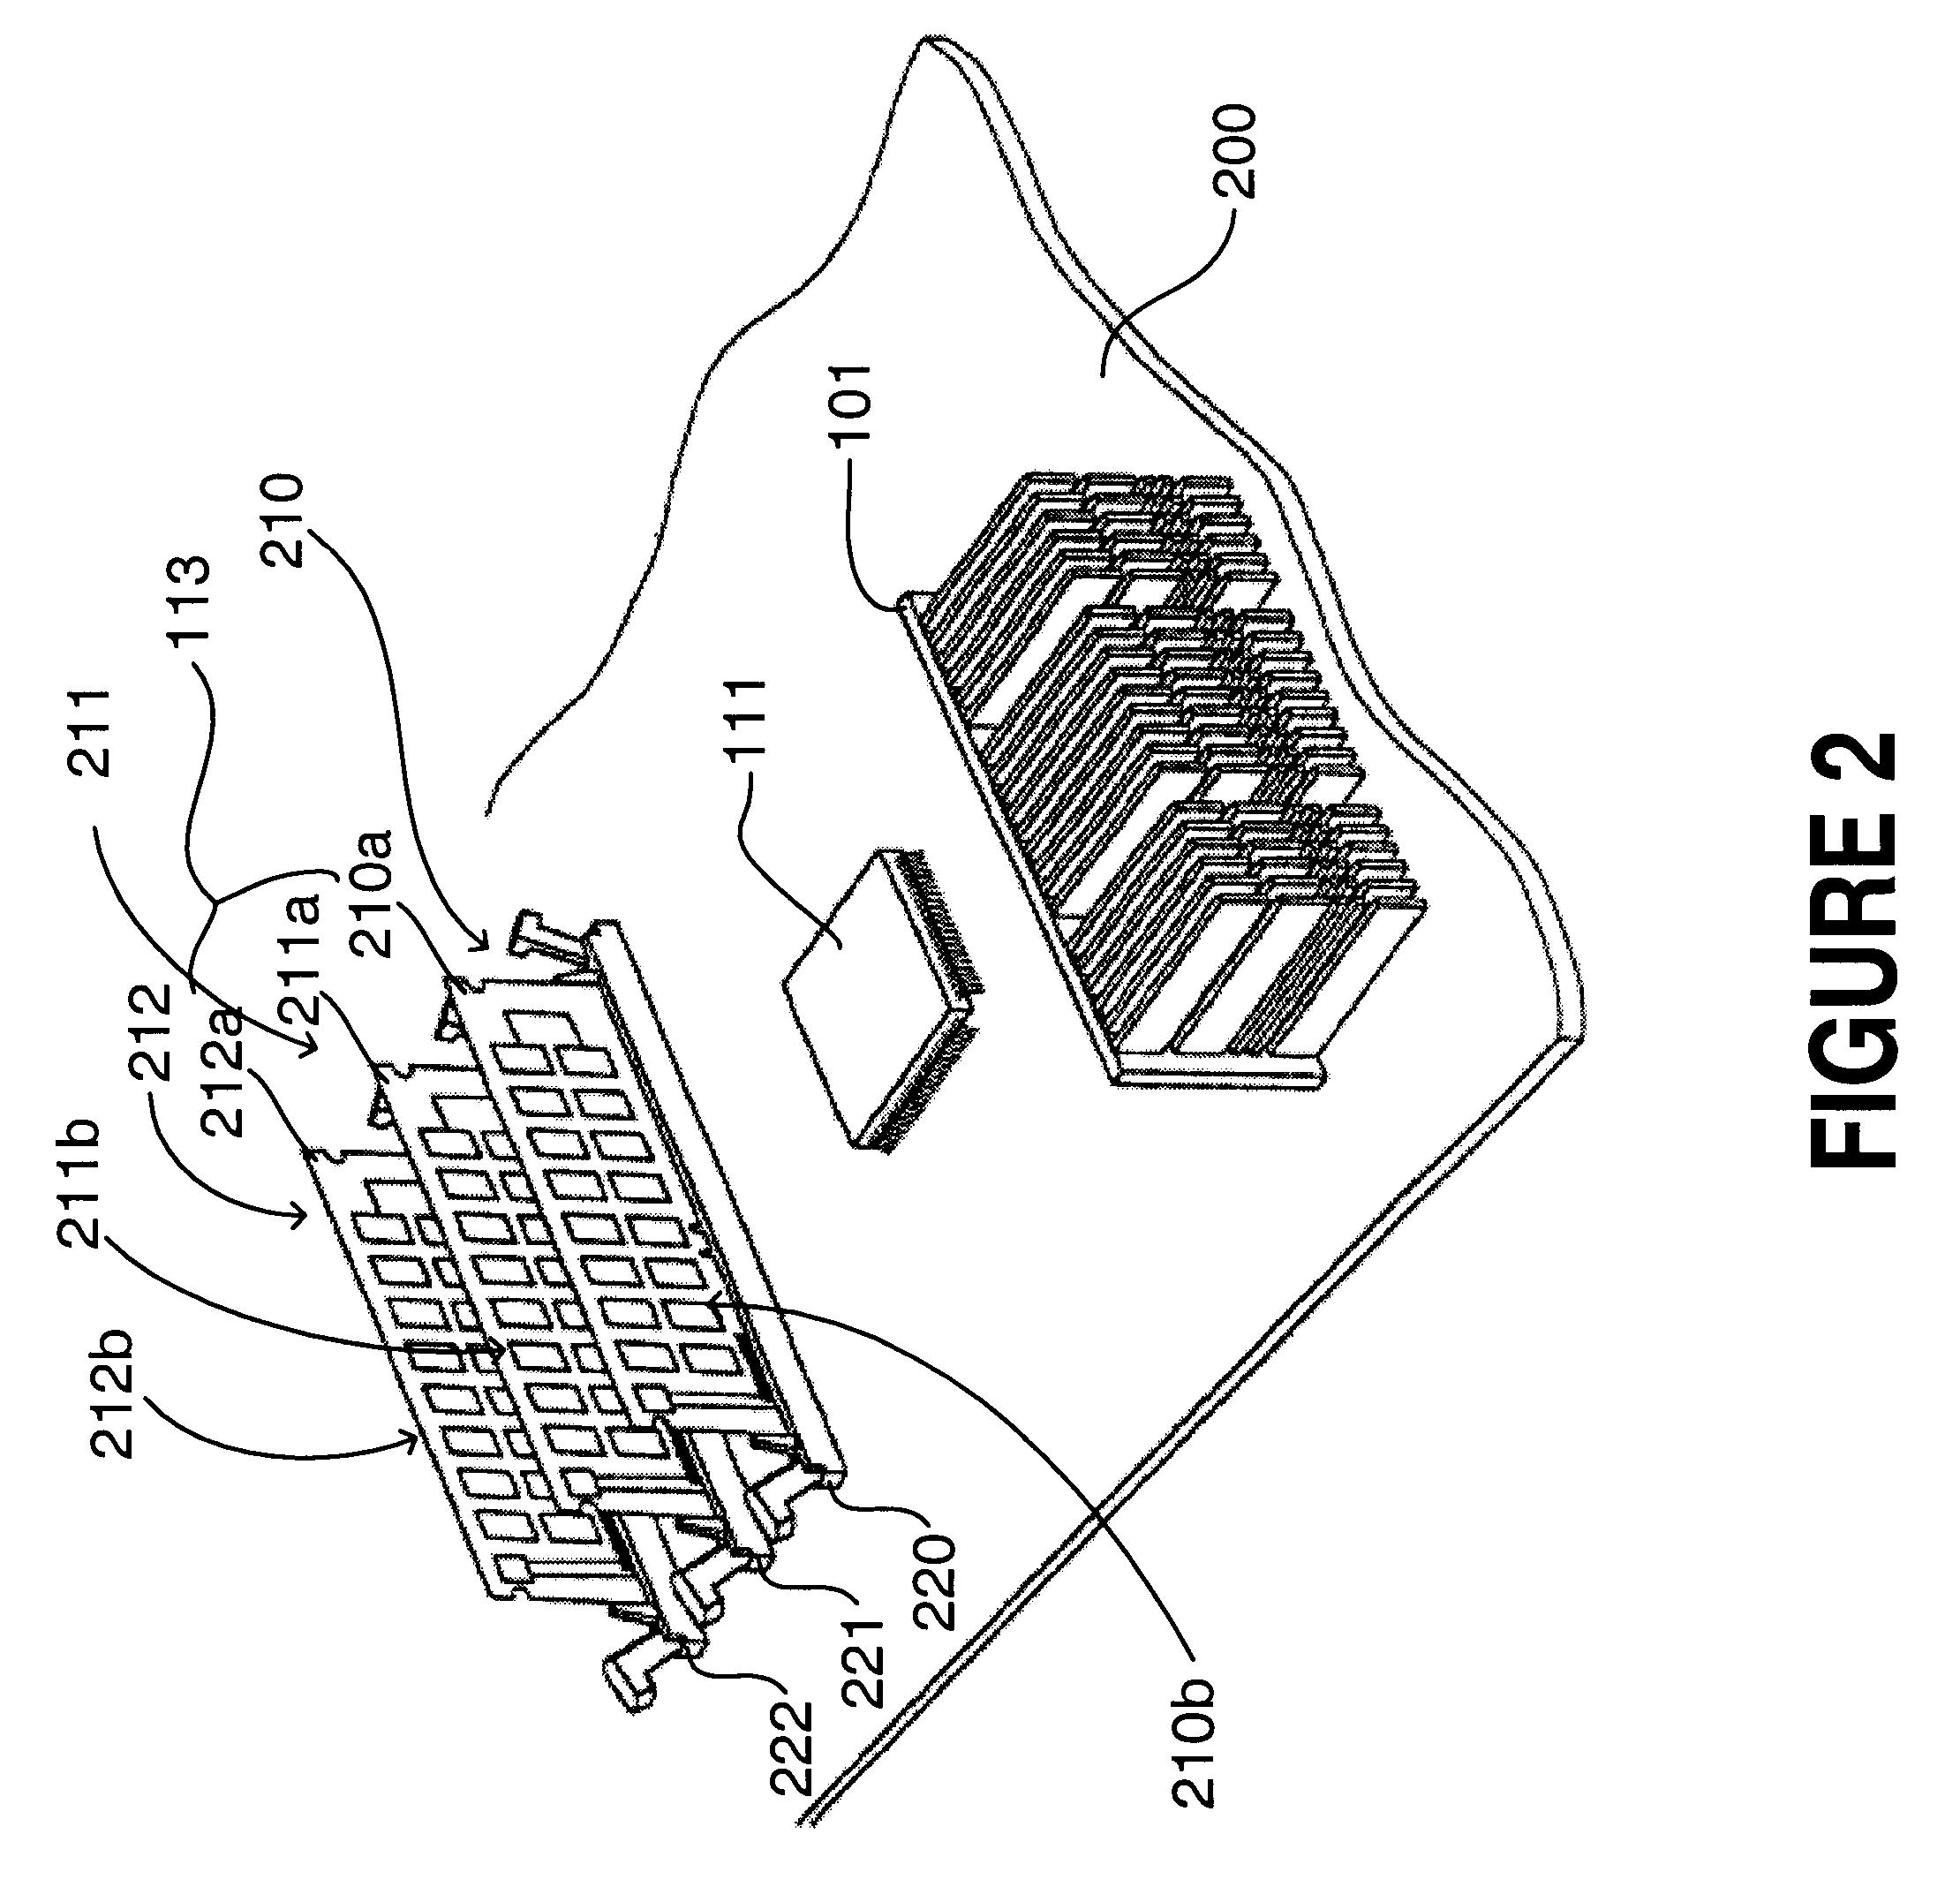 warn winch 5687 wiring diagram database Warn Winch M8000 Wiring Diagram 5687 pre schematic wiring diagram database warn winch rope patent us6625687 memory module employing a junction